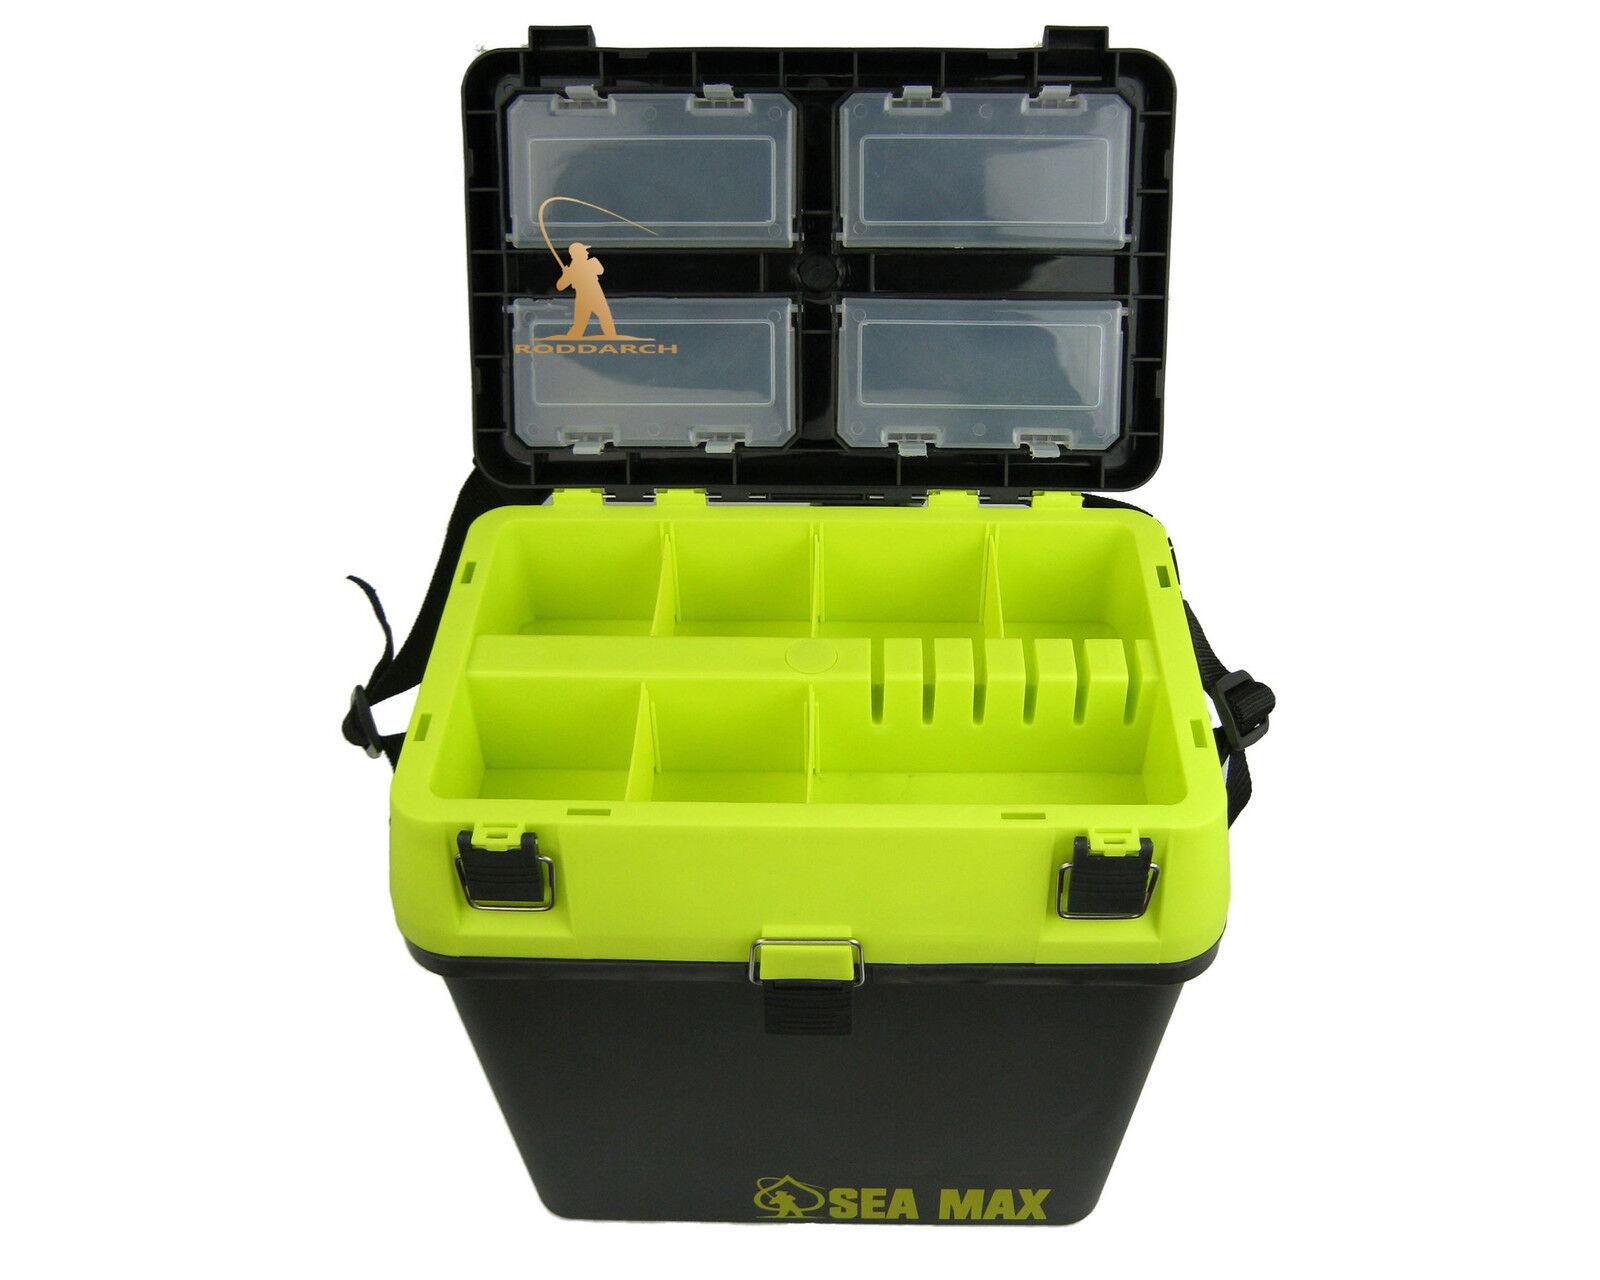 Sea fishing tackle seat box roddarch sea max genuine for Fishing tackle box